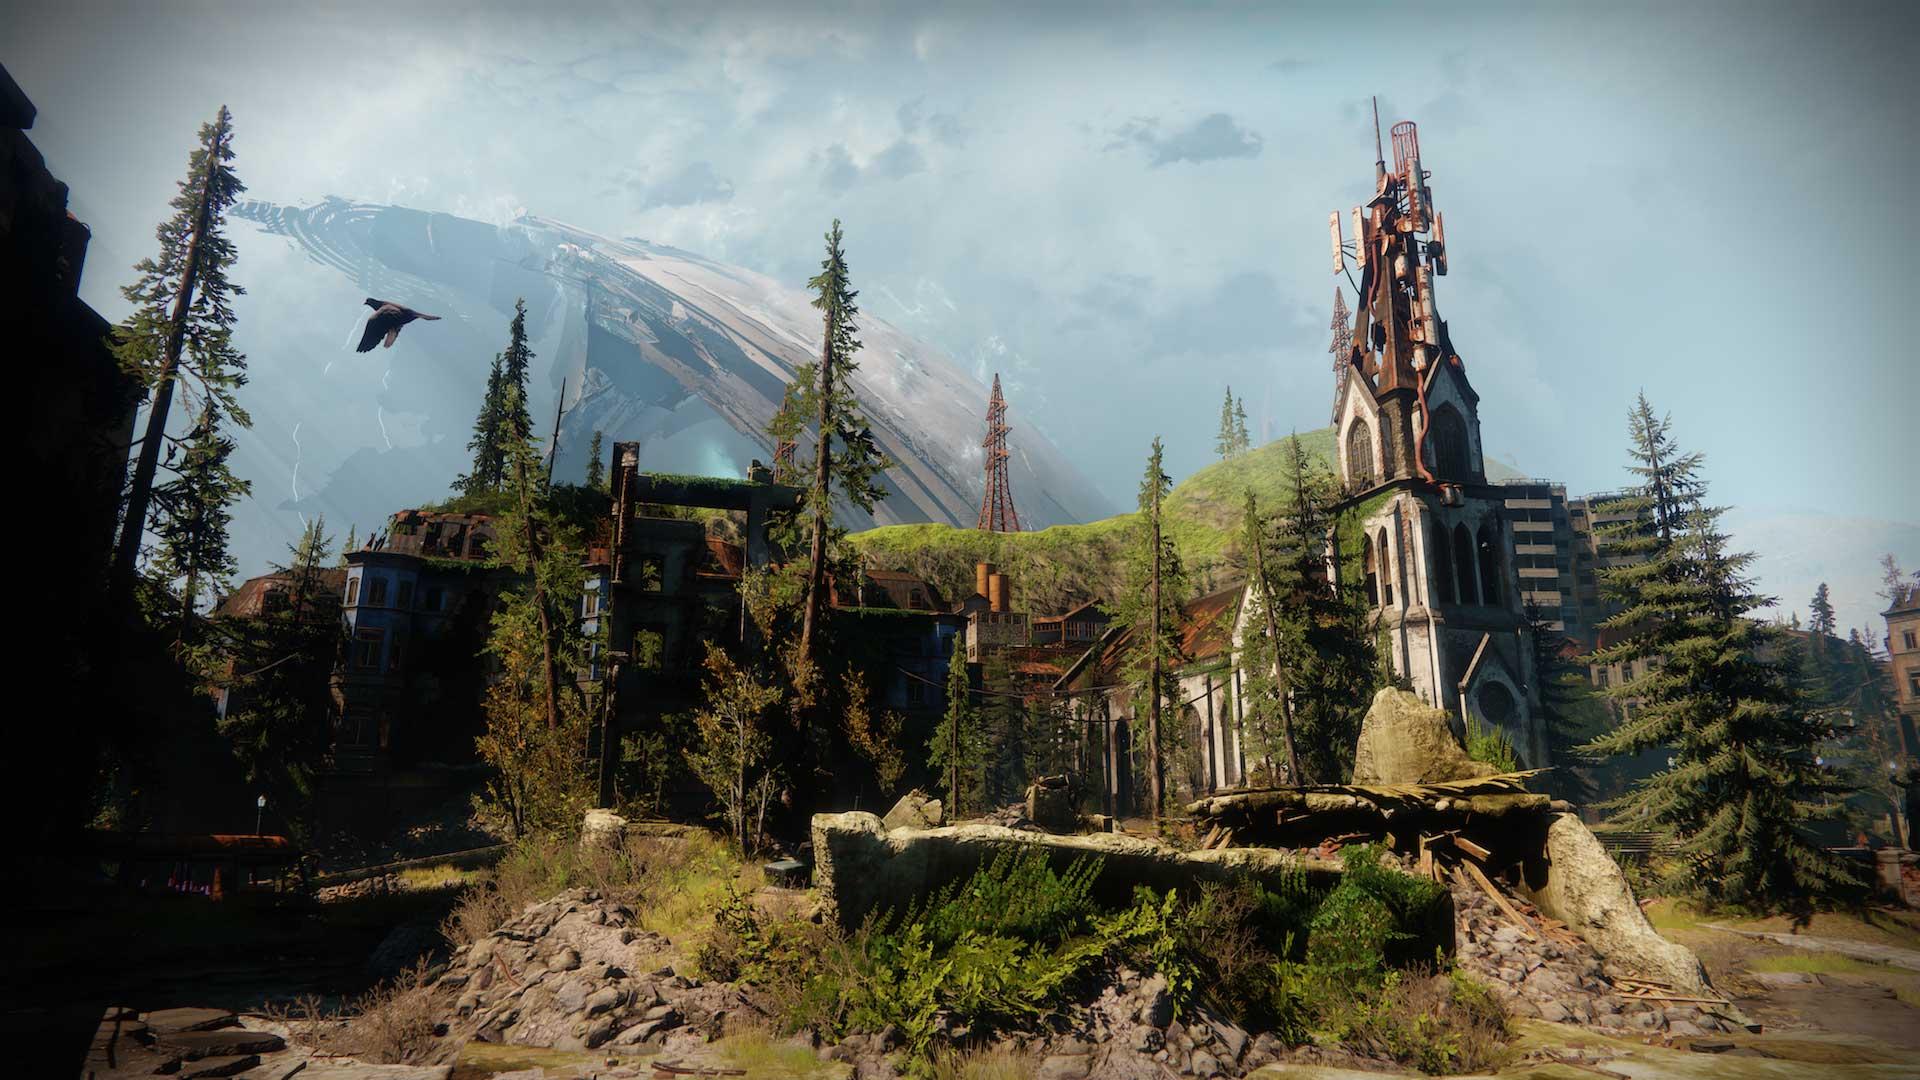 Destiny 2 Screenshots Und Concepts Zu Waffen PS4 Exclusives Ghaul